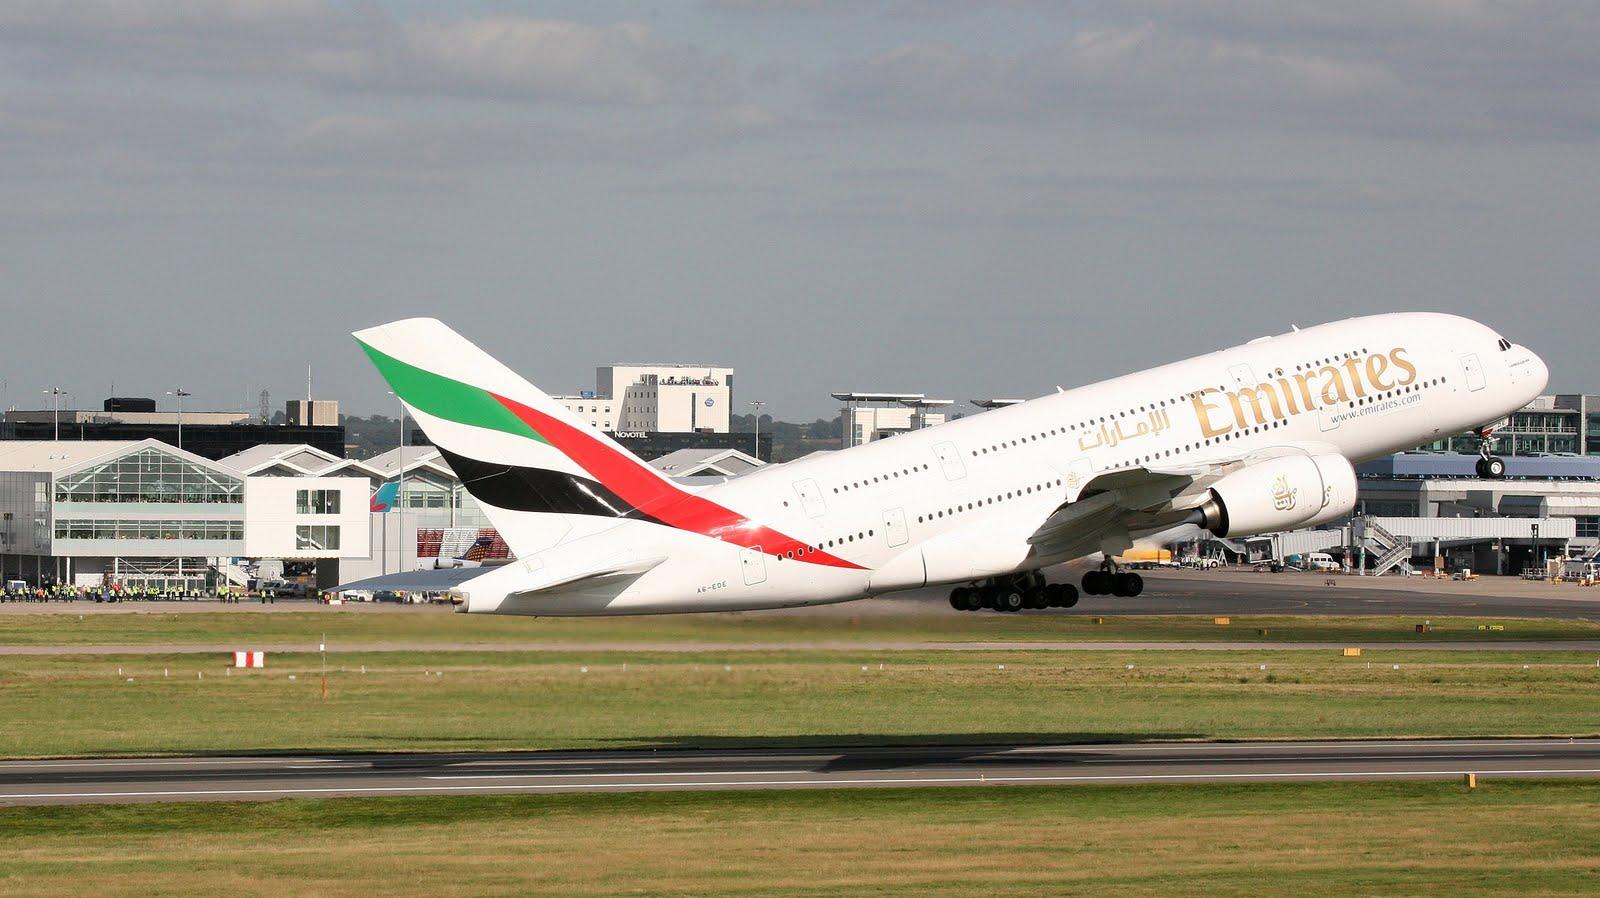 http://4.bp.blogspot.com/_ja676MG45Zg/S_VyCeBrTKI/AAAAAAAADXA/ezuS0qrPy_s/s1600/emirates-airbus-a380-take-0ff-111.jpg